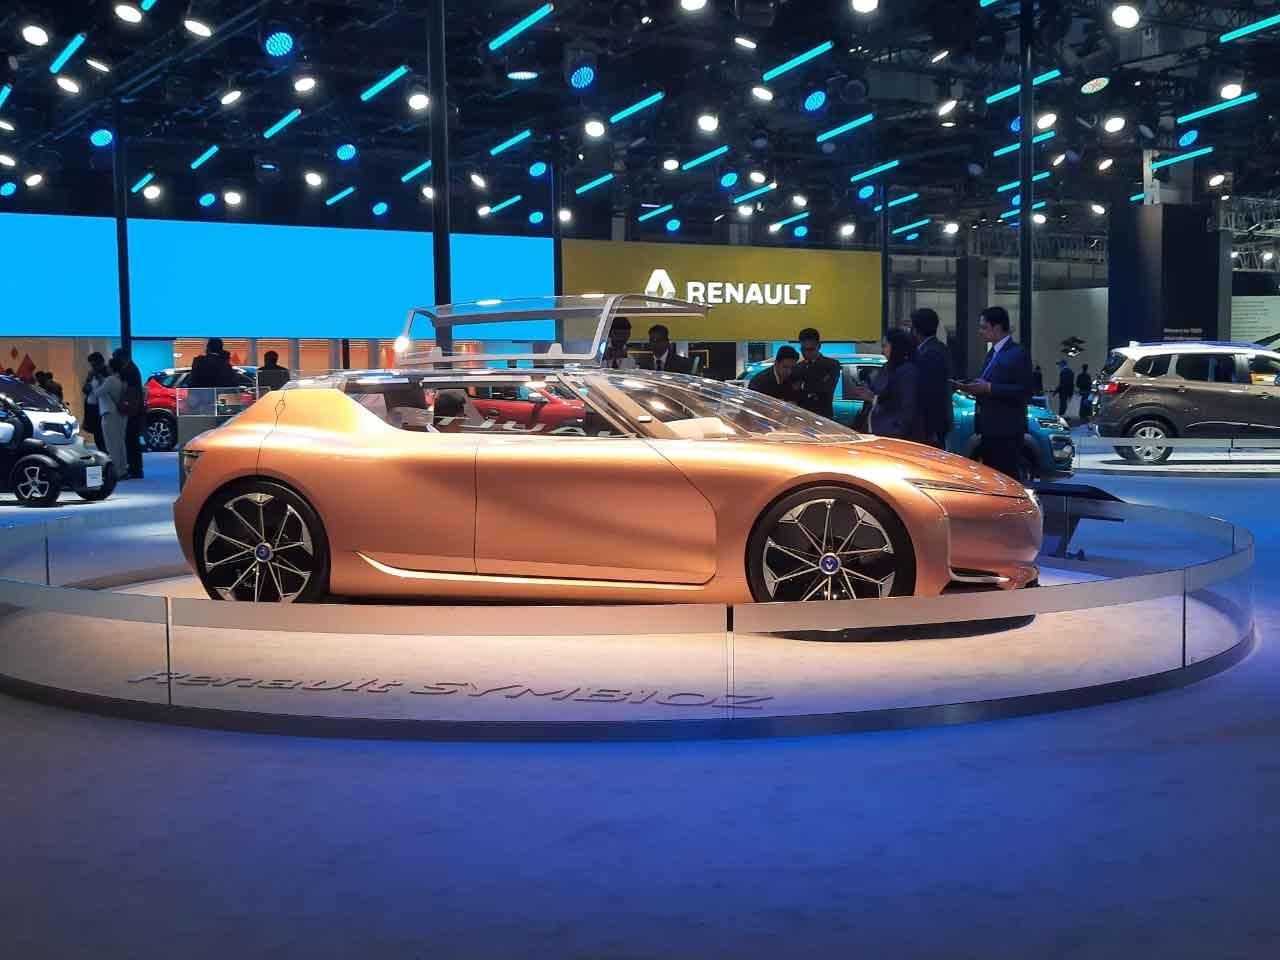 Renault electric vehicle SYMBIOZ concept